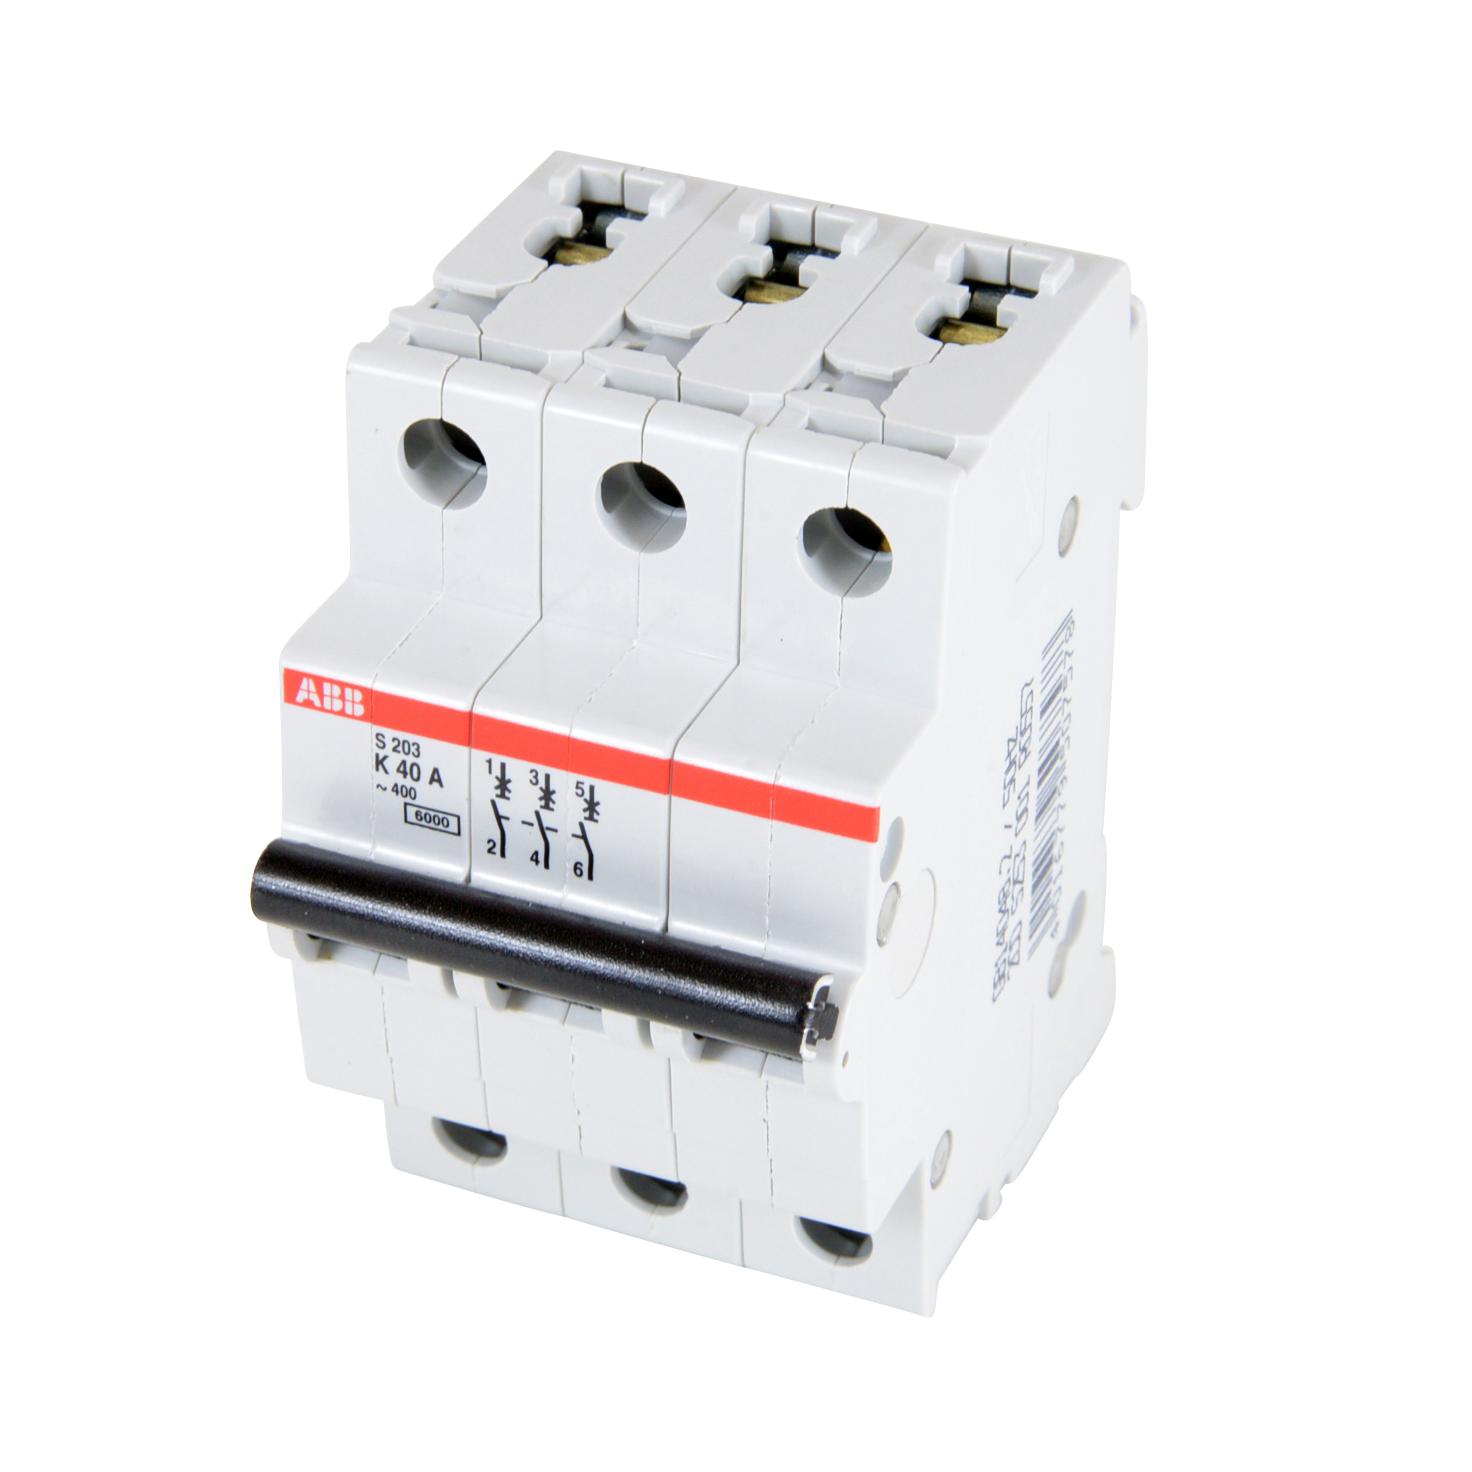 ABB,S203-K40,ABB S200 Miniature Circuit Breaker, 277/480 VAC, 40 A, 6 kA Interrupt, 3 Poles, Thermal Magnetic Trip